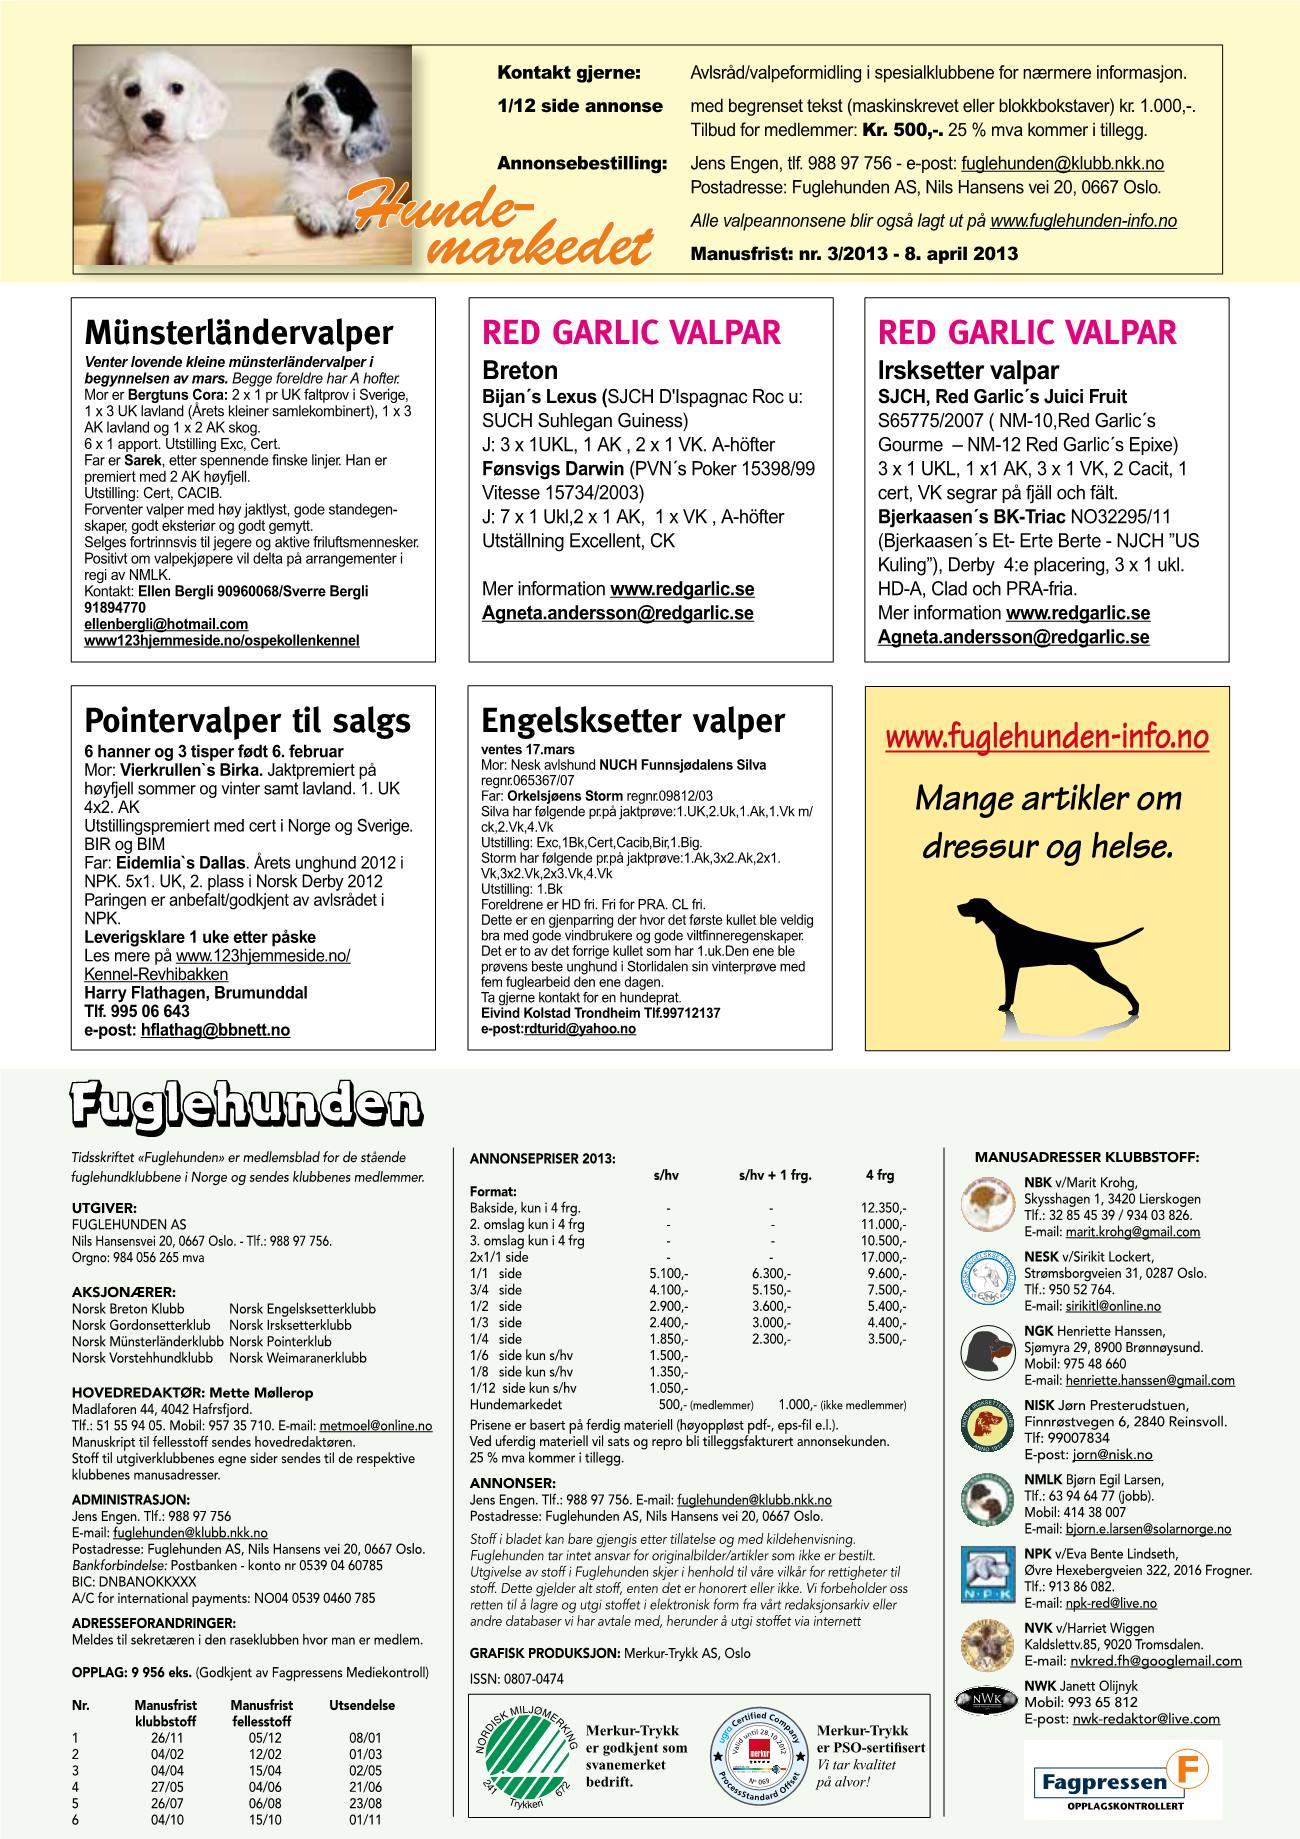 1cffd531 Index of /dm/fuglehunden-2-13/files/assets/mobile/pages